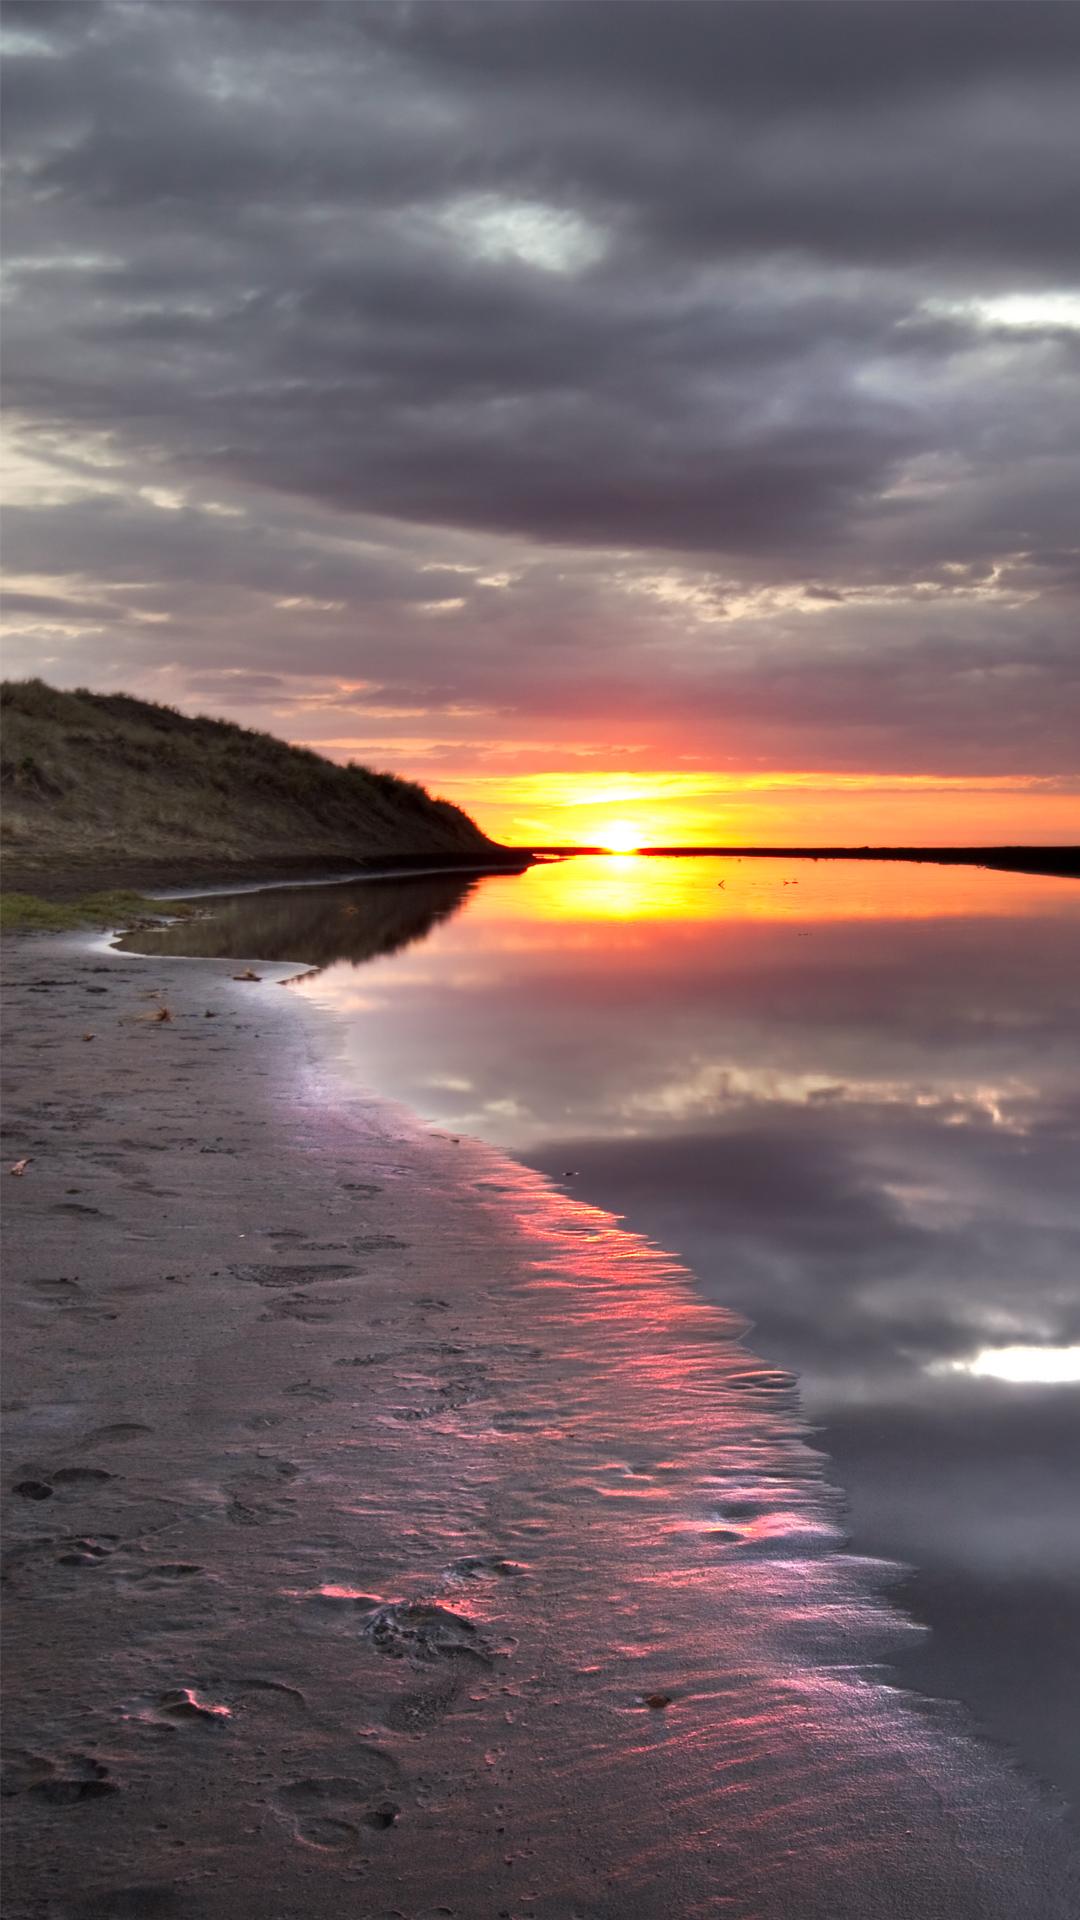 Art Sunset iPhone 7 Plus Wallpaper Gallery Yopriceville   High 1080x1920